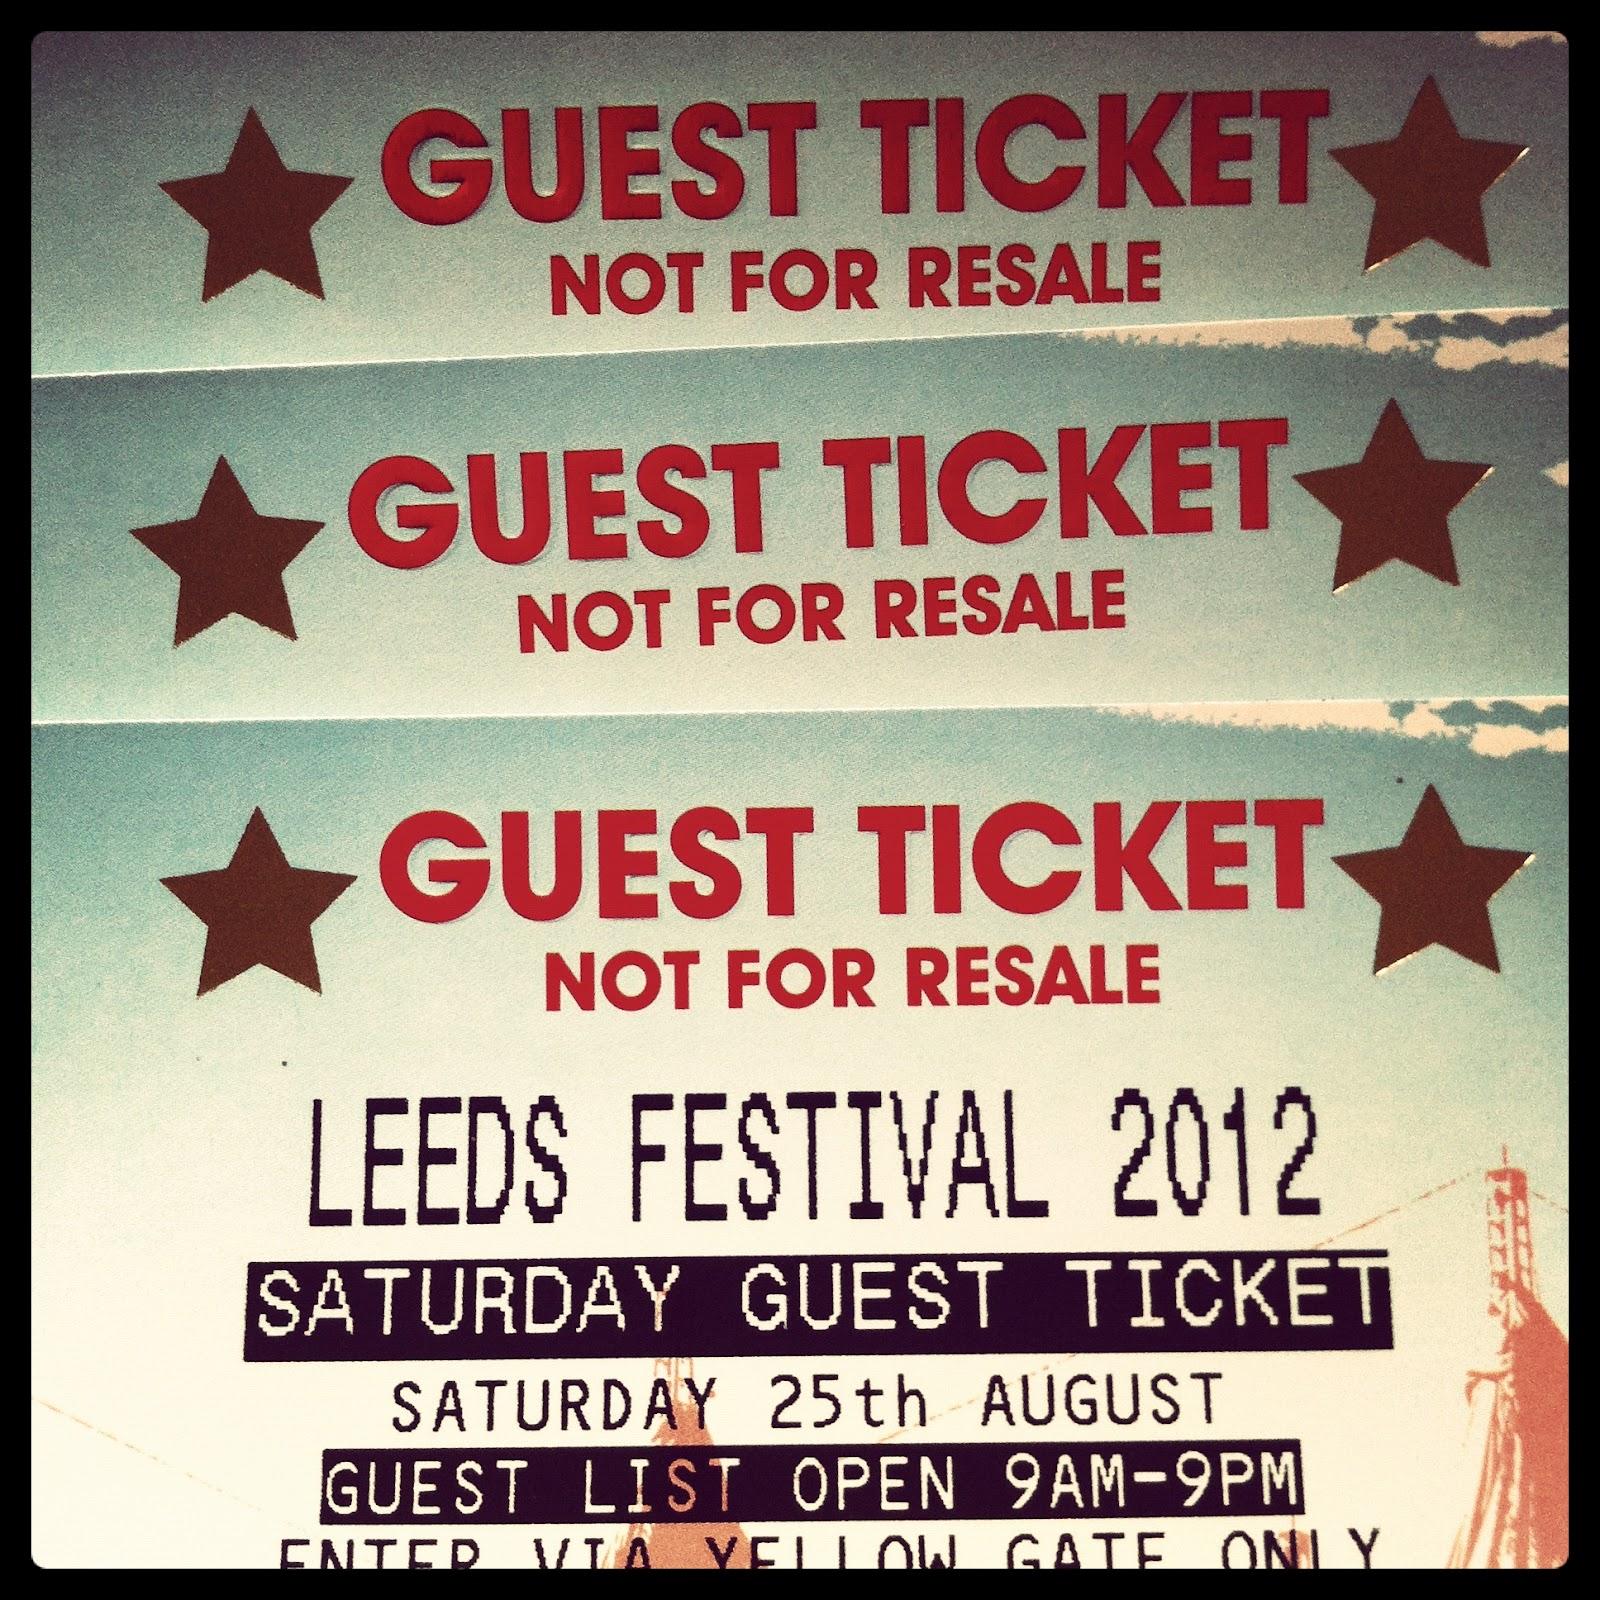 leeds festival - photo #26